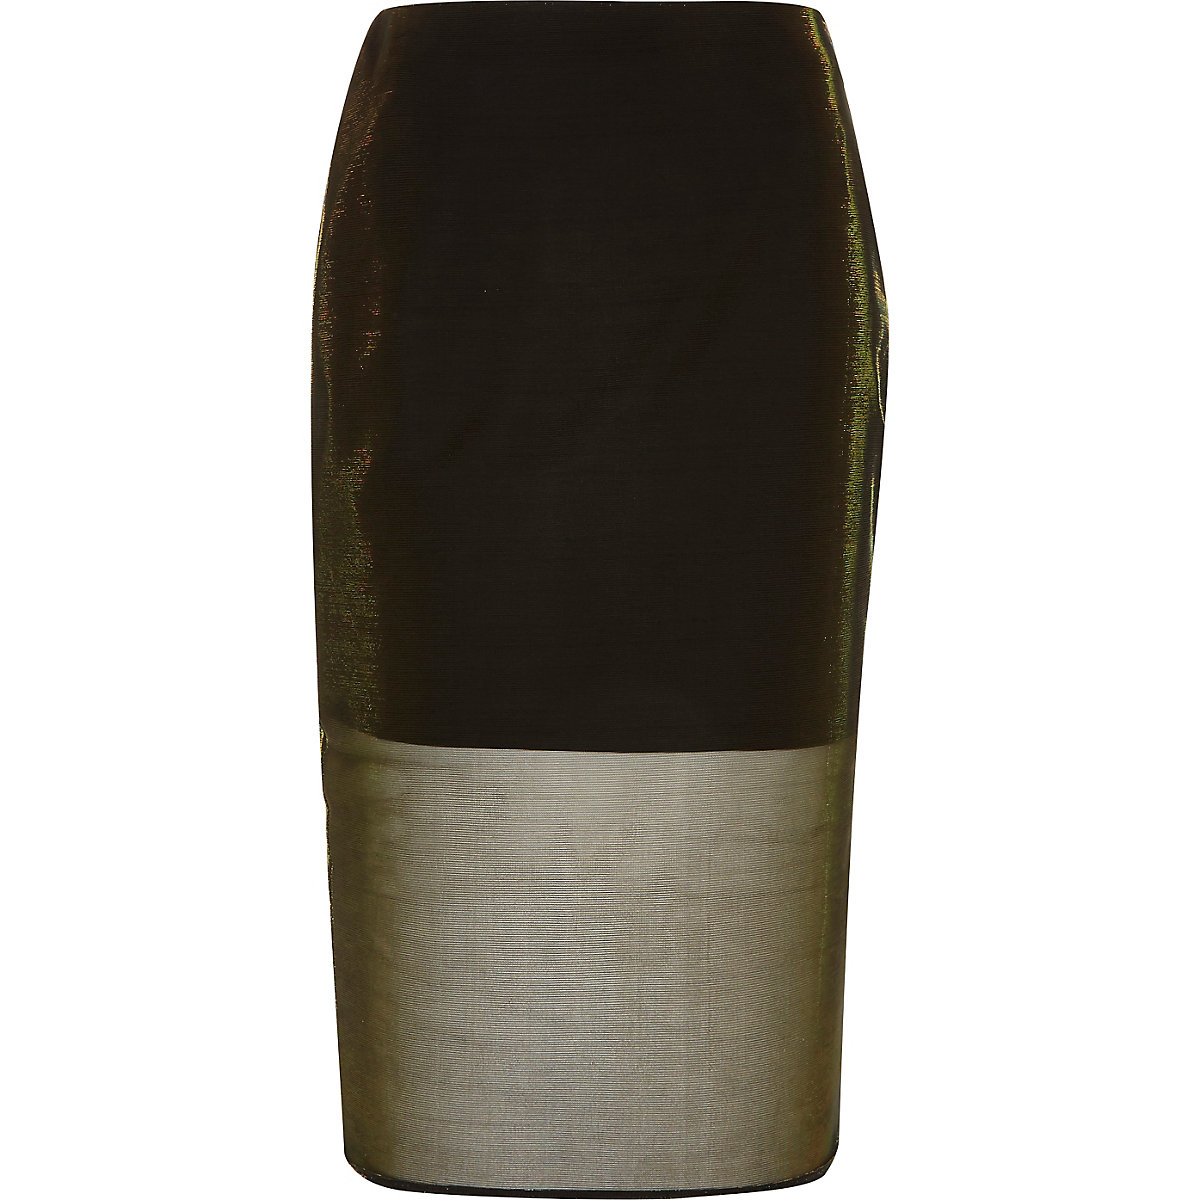 Gold metallic mesh pencil skirt